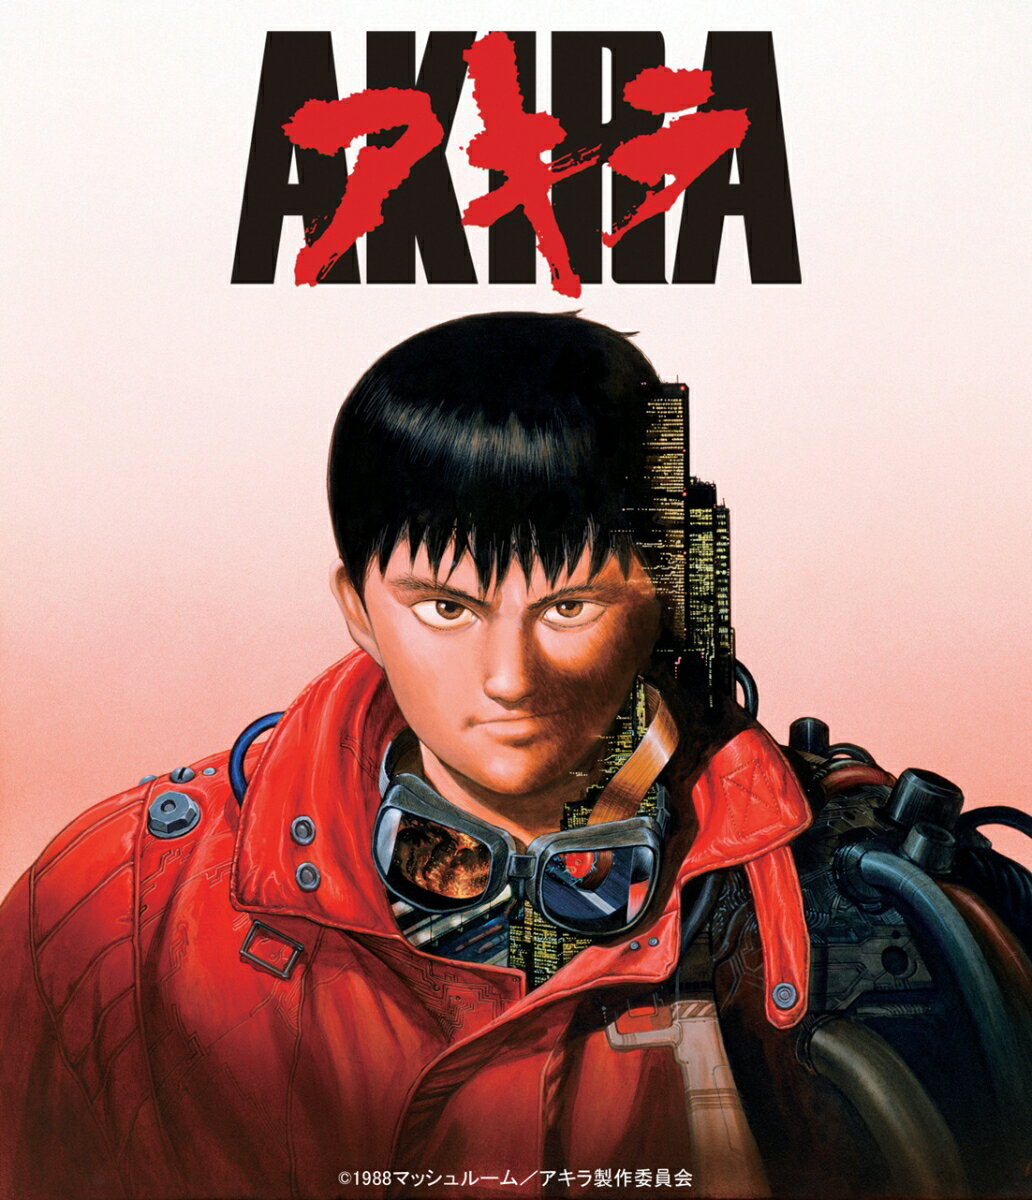 AKIRA 4Kリマスターセット(4K ULTRA HD Blu-ray & Blu-ray Disc 2枚組)(特装限定版)【4K ULTRA HD】